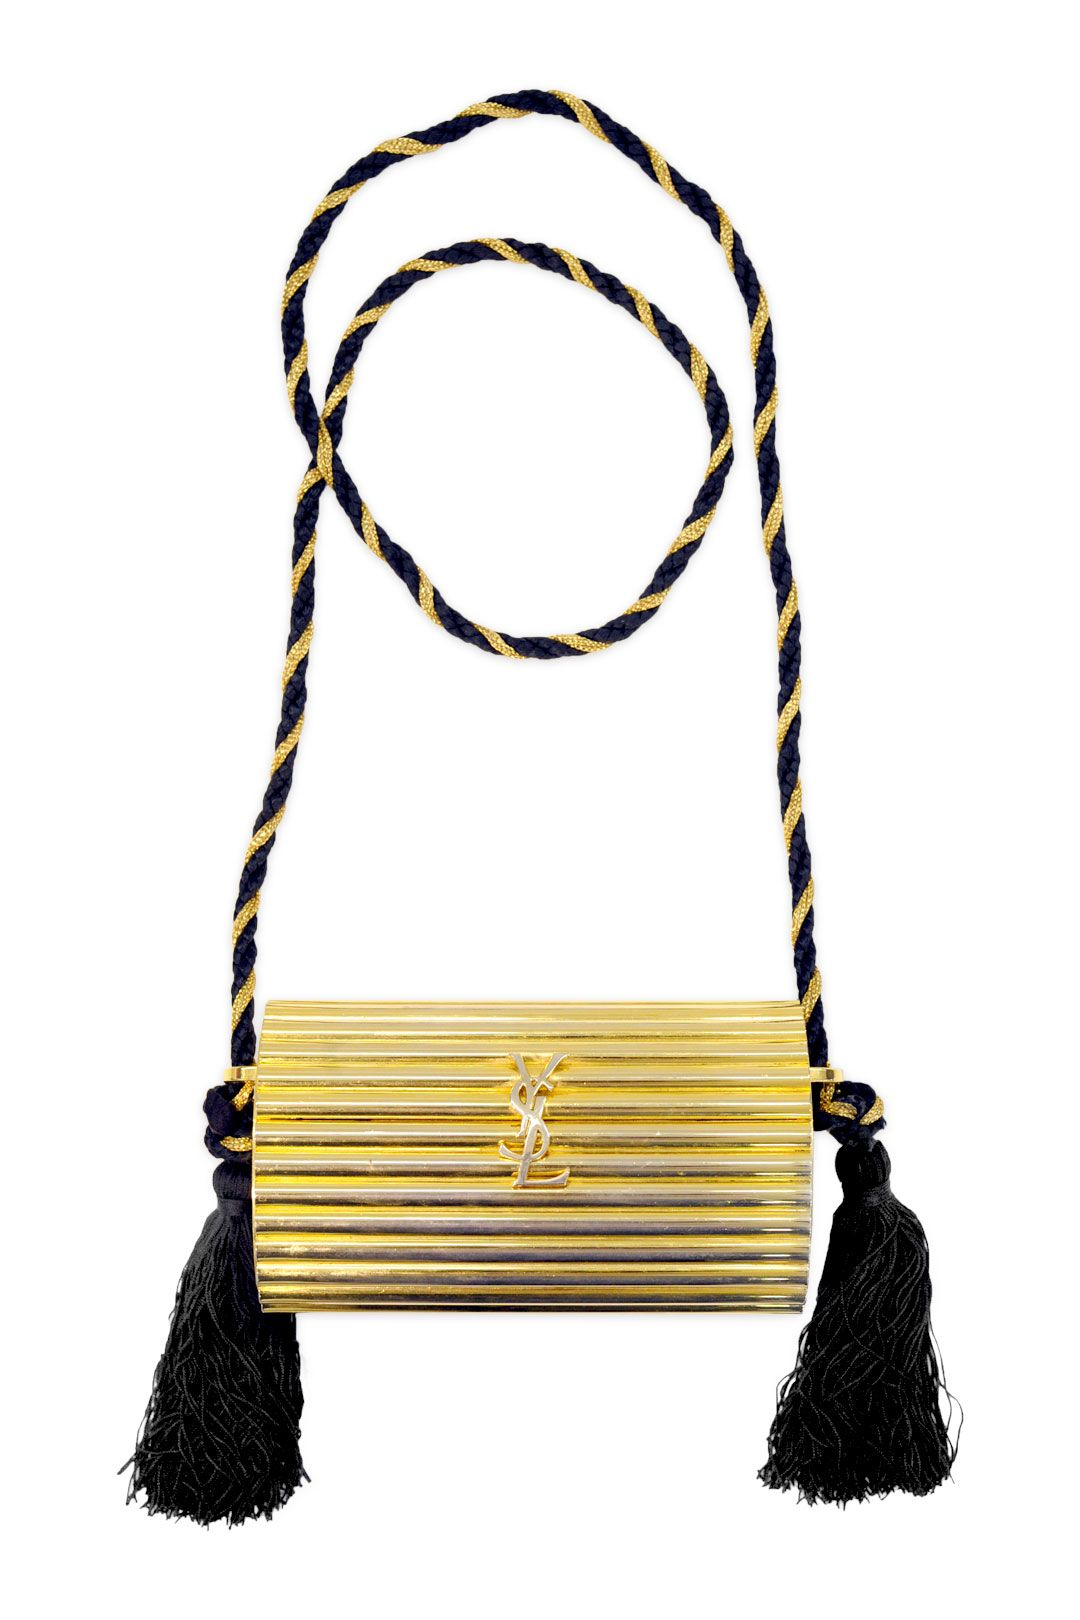 d7fb23b4d08e Vintage YSL Gold Tassel Clutch